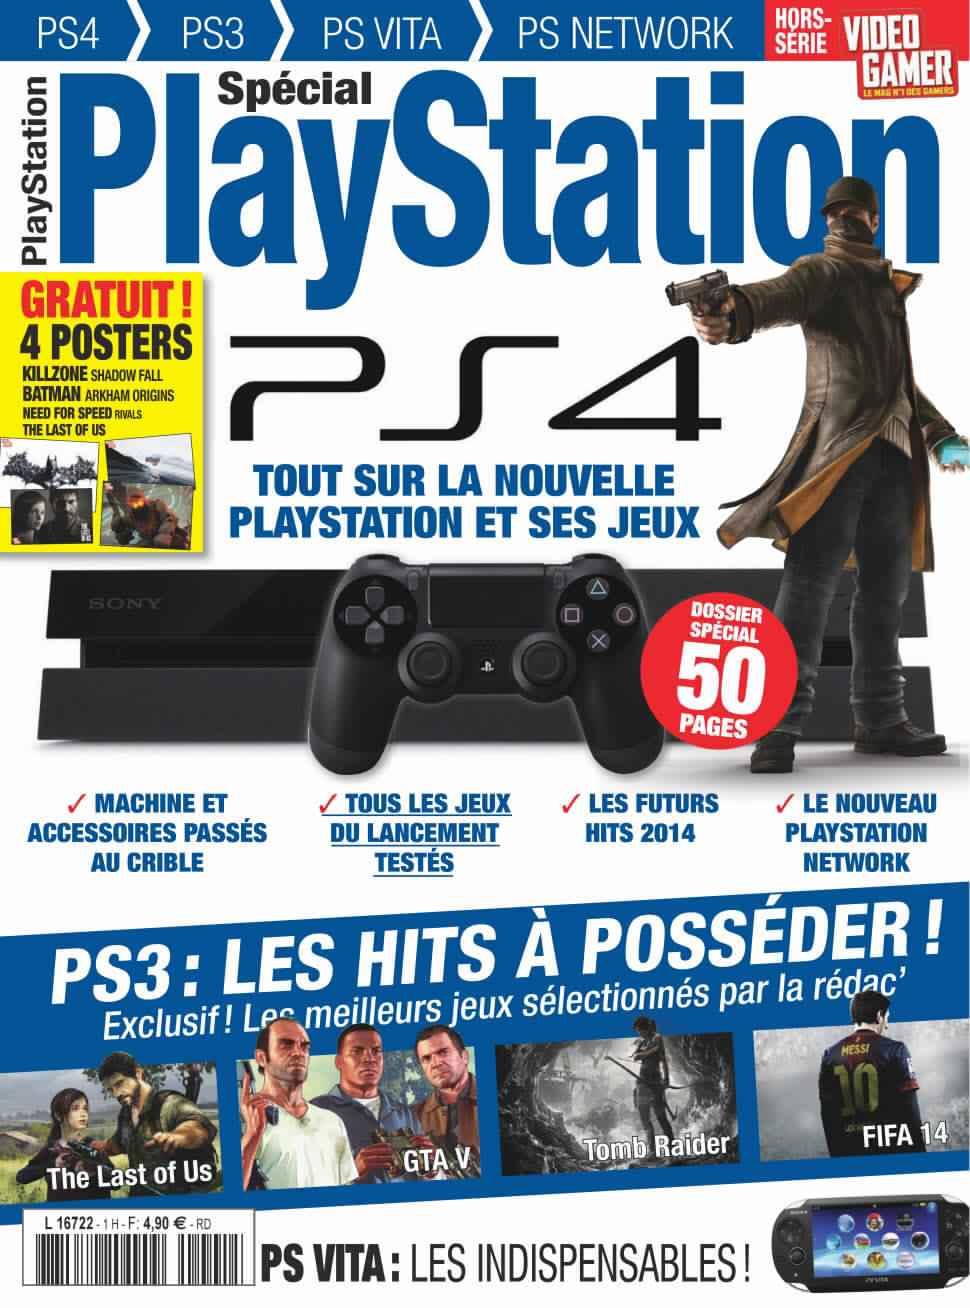 Video Gamer Hors-Série 1 - 2013